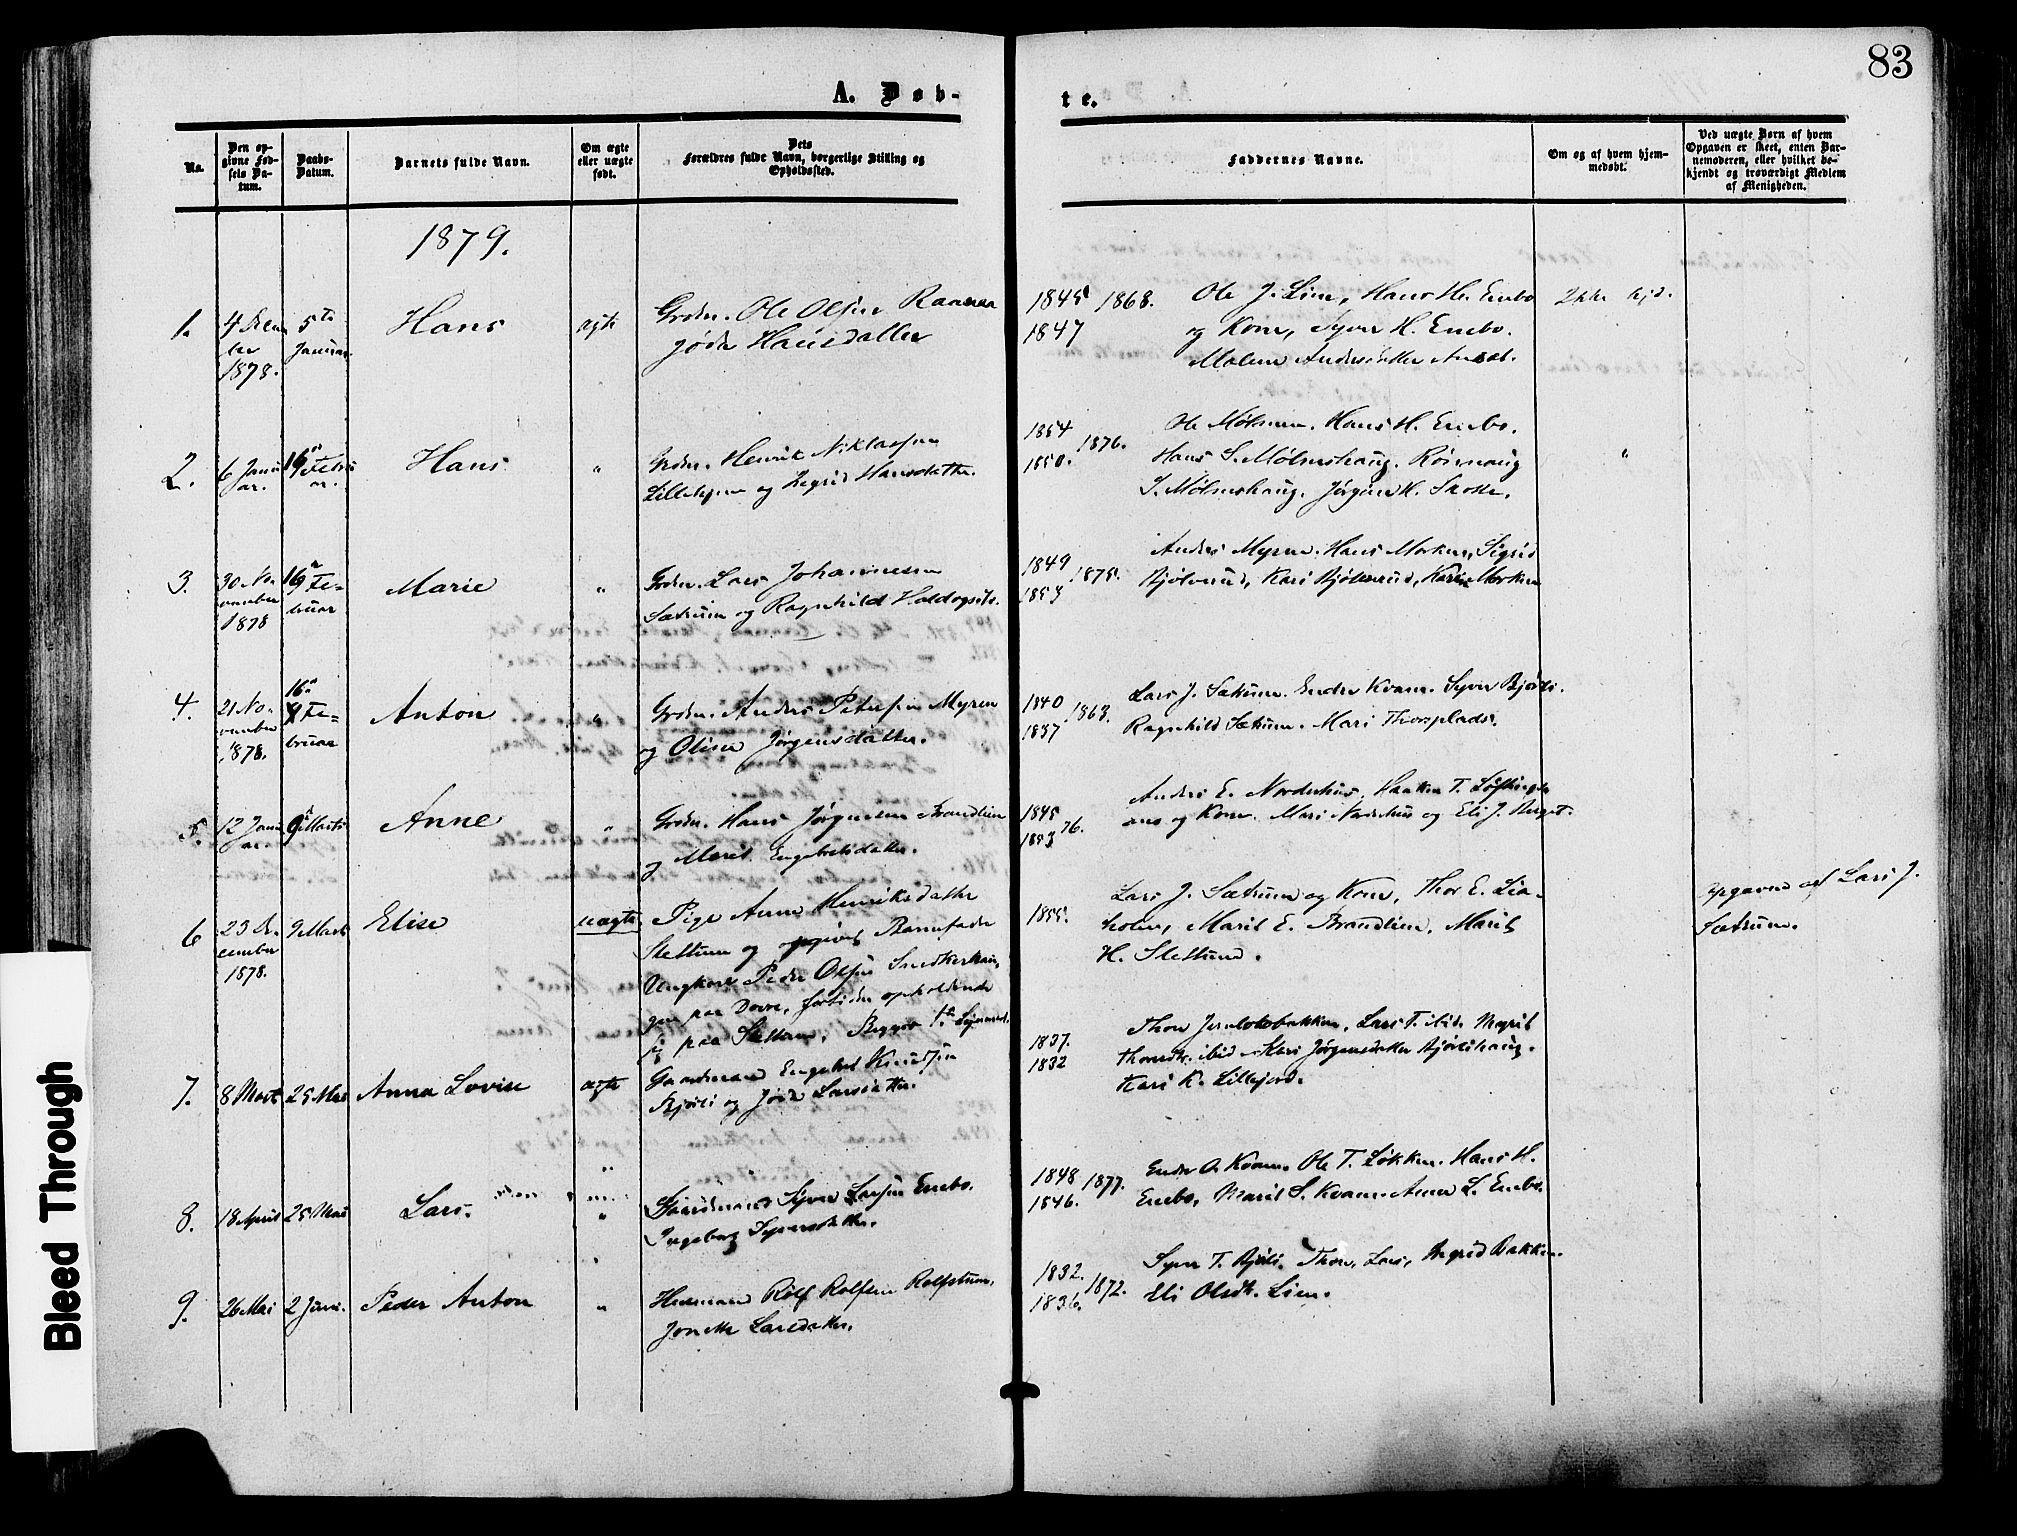 SAH, Lesja prestekontor, Ministerialbok nr. 9, 1854-1889, s. 83